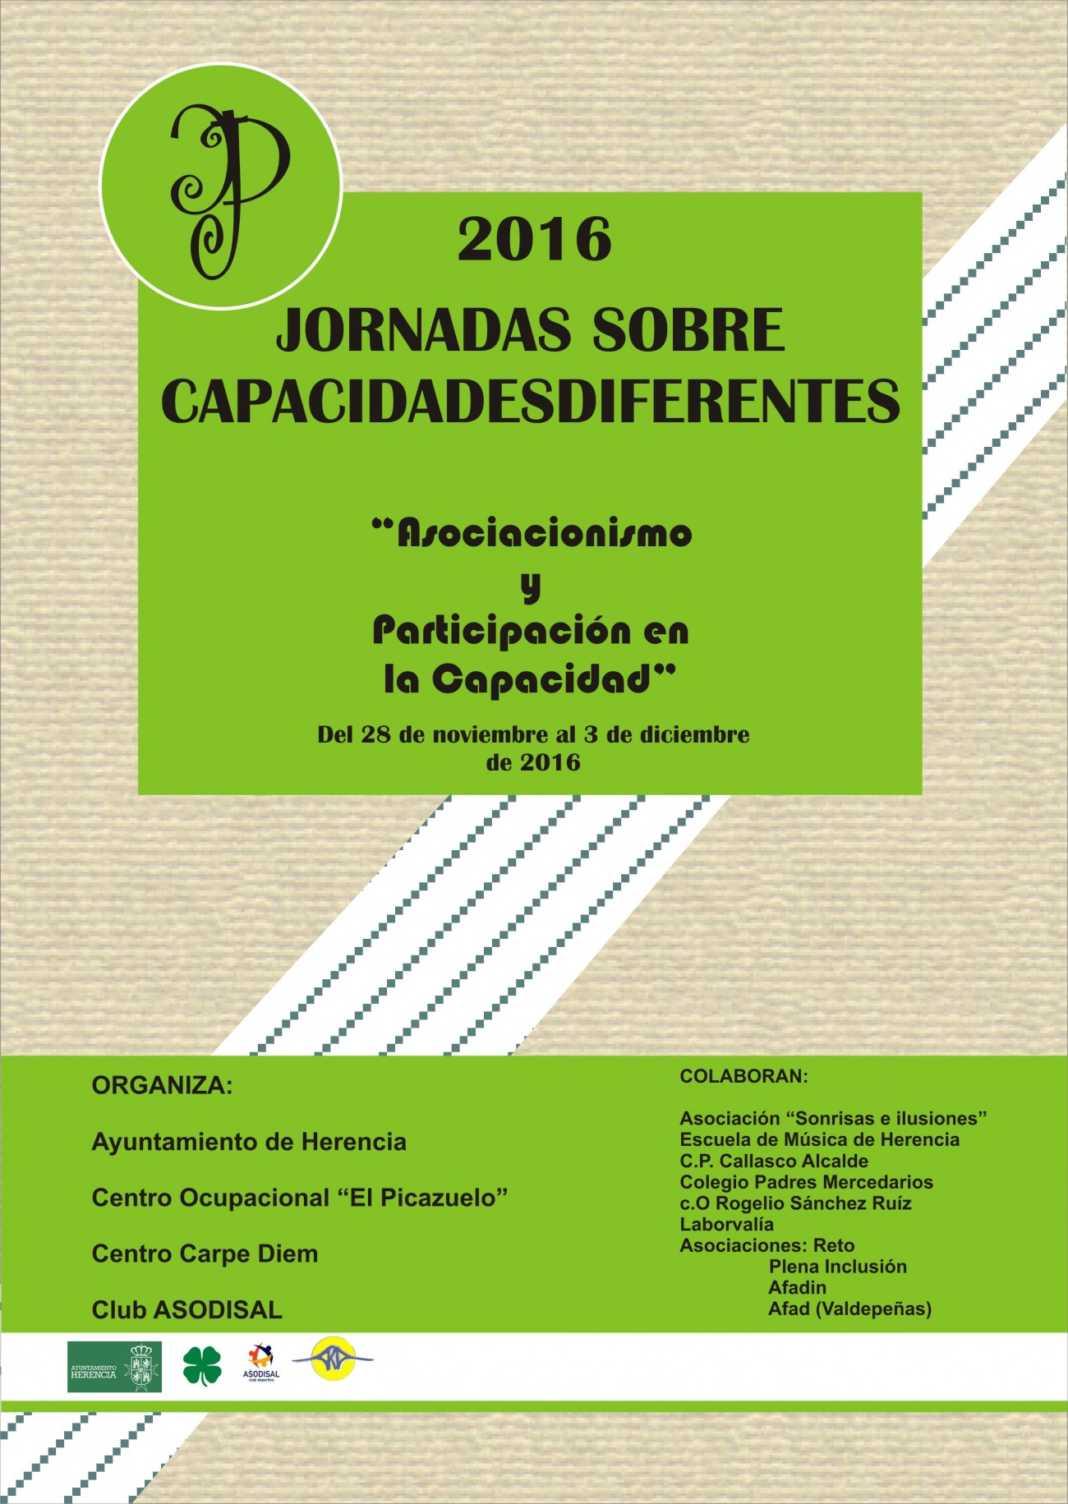 Jornadas sobre capacidades diferentes 2016 en Herencia 6